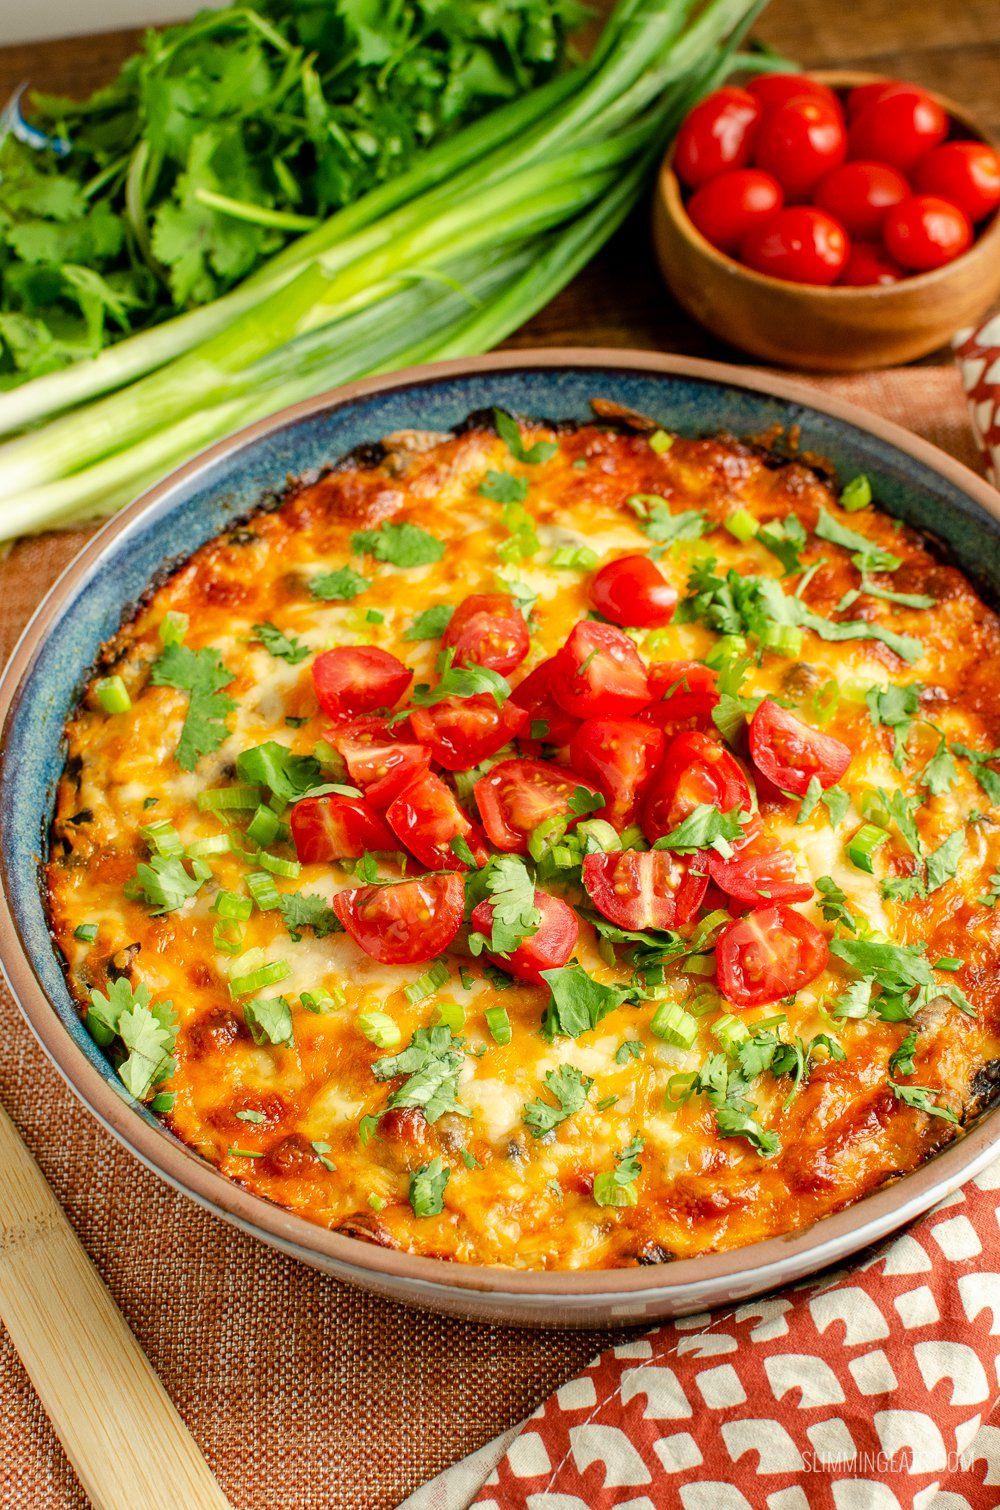 Mexican Spaghetti Squash Bake | Slimming Eats - Slimming World